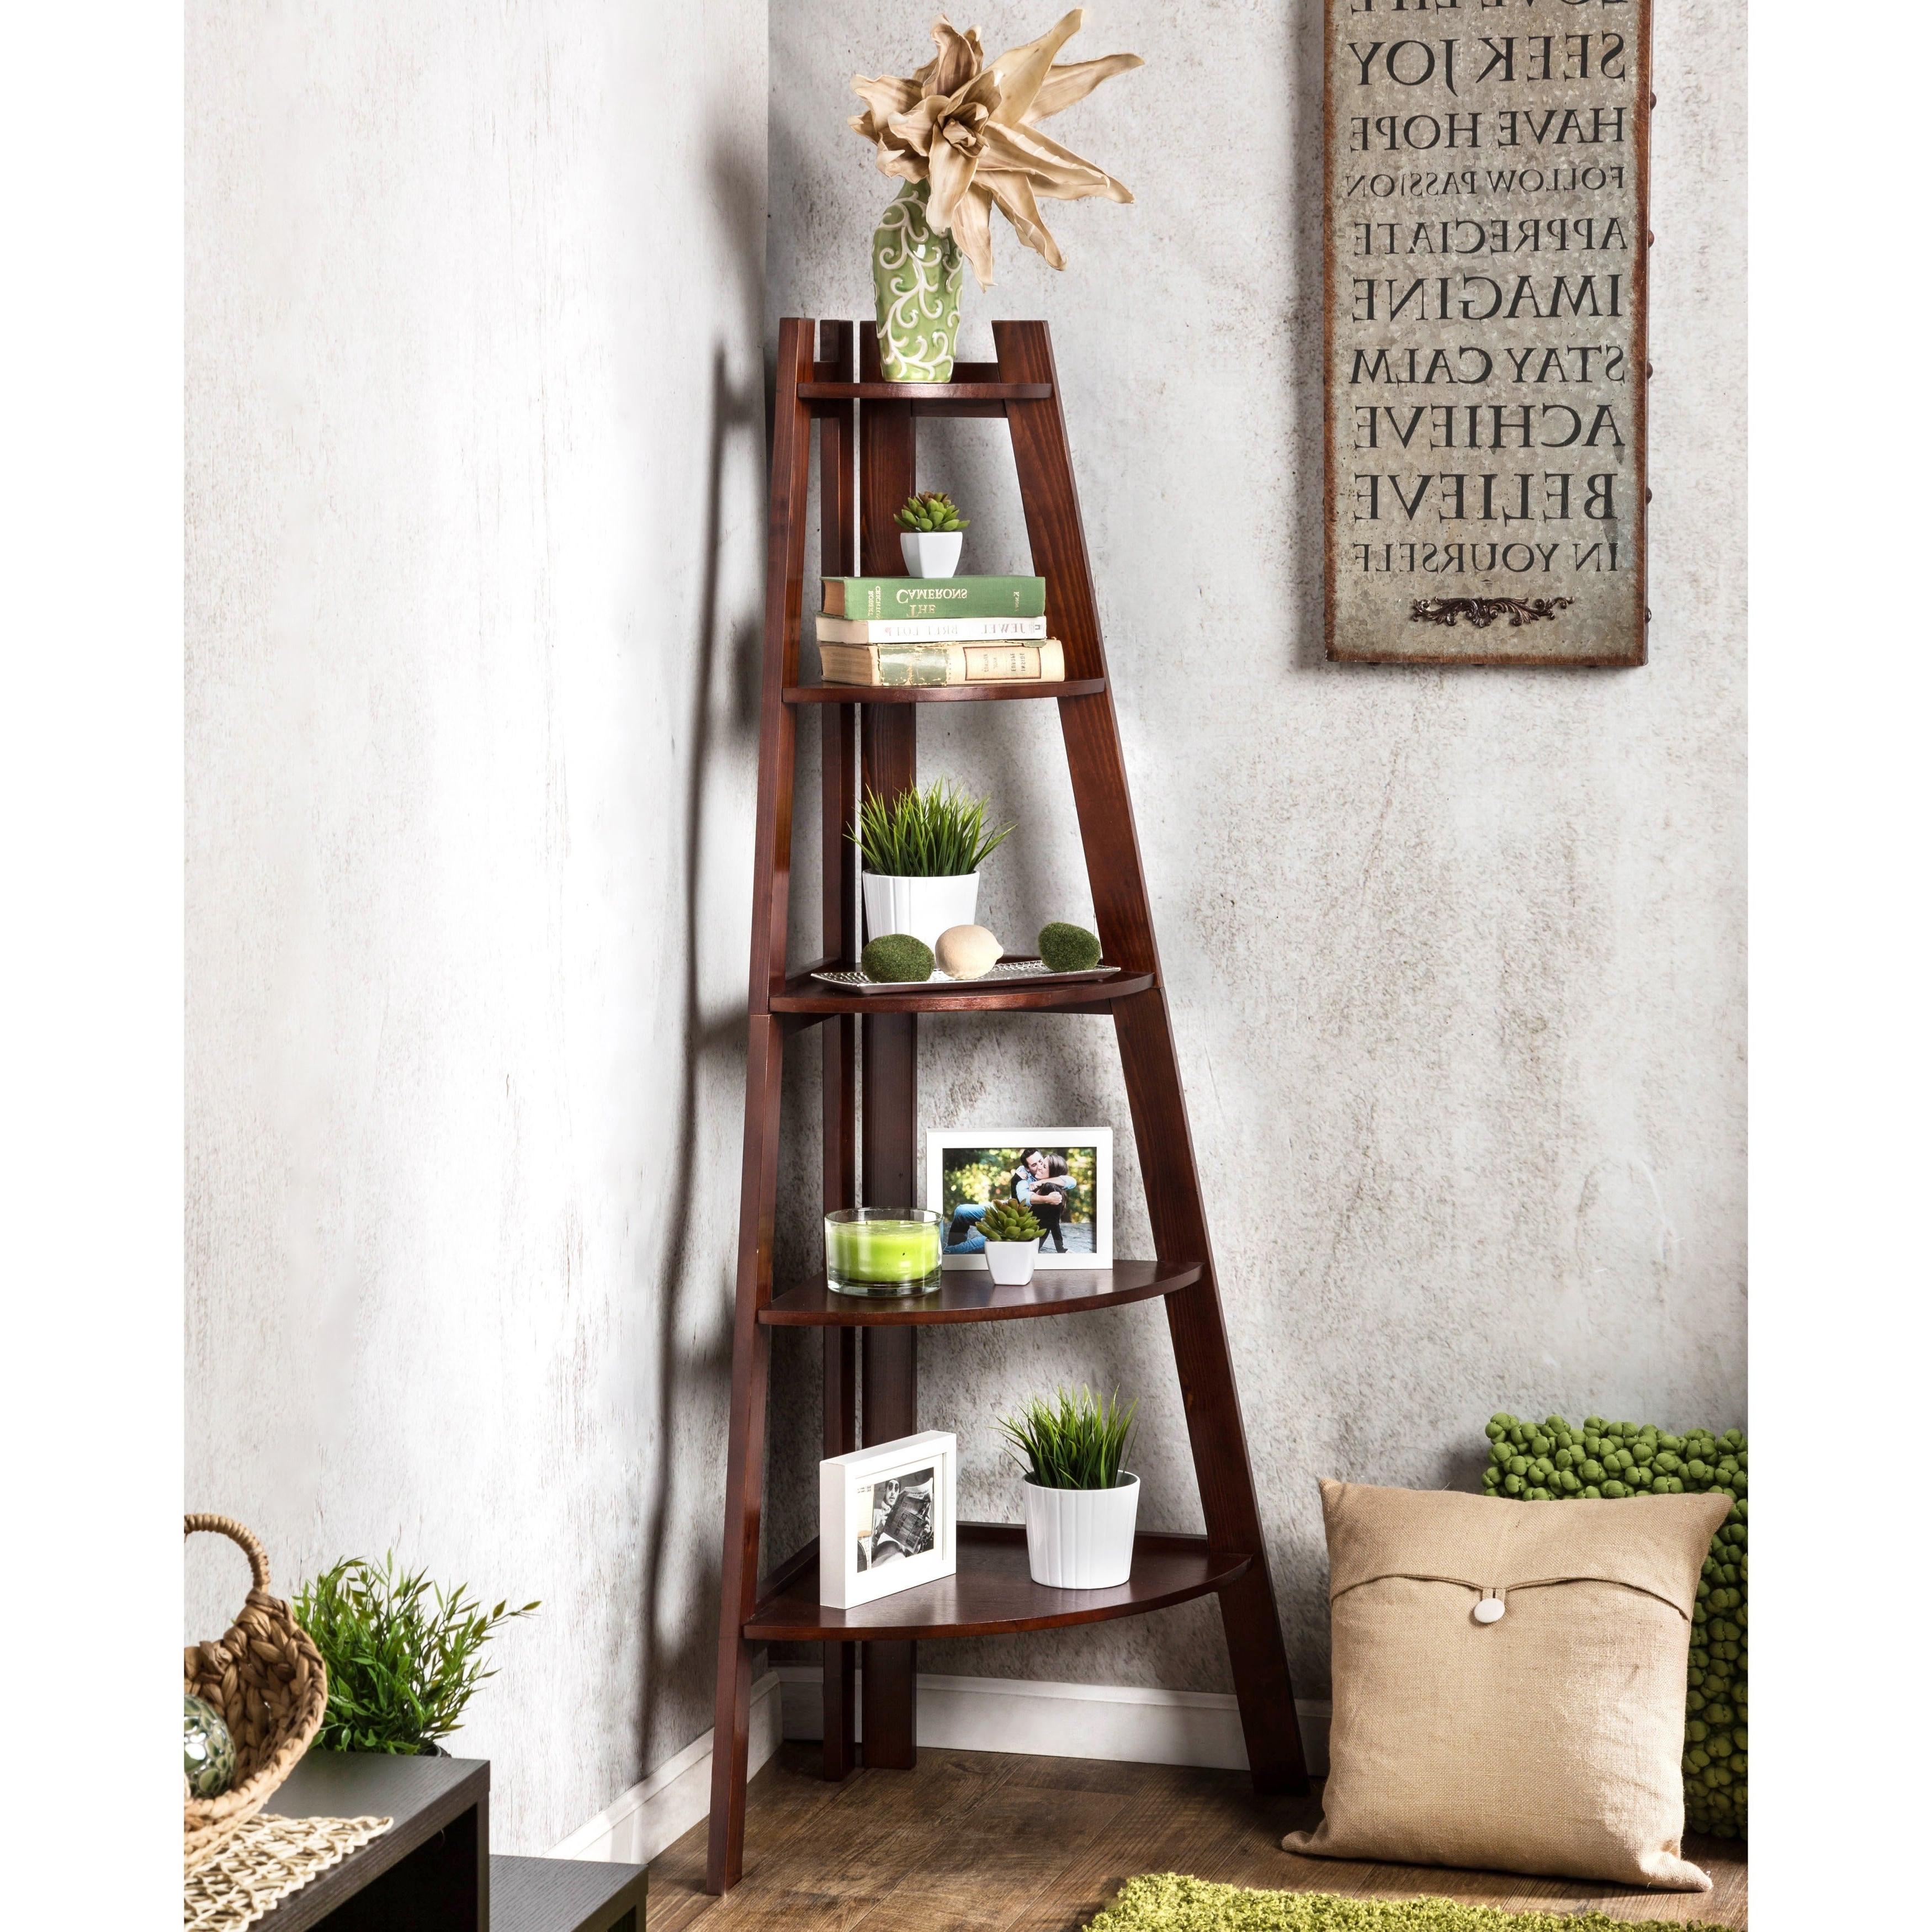 2020 Mari Wood Corner Bookcases Pertaining To Buy Wood, Corner Bookshelves & Bookcases Online At Overstock (View 1 of 20)